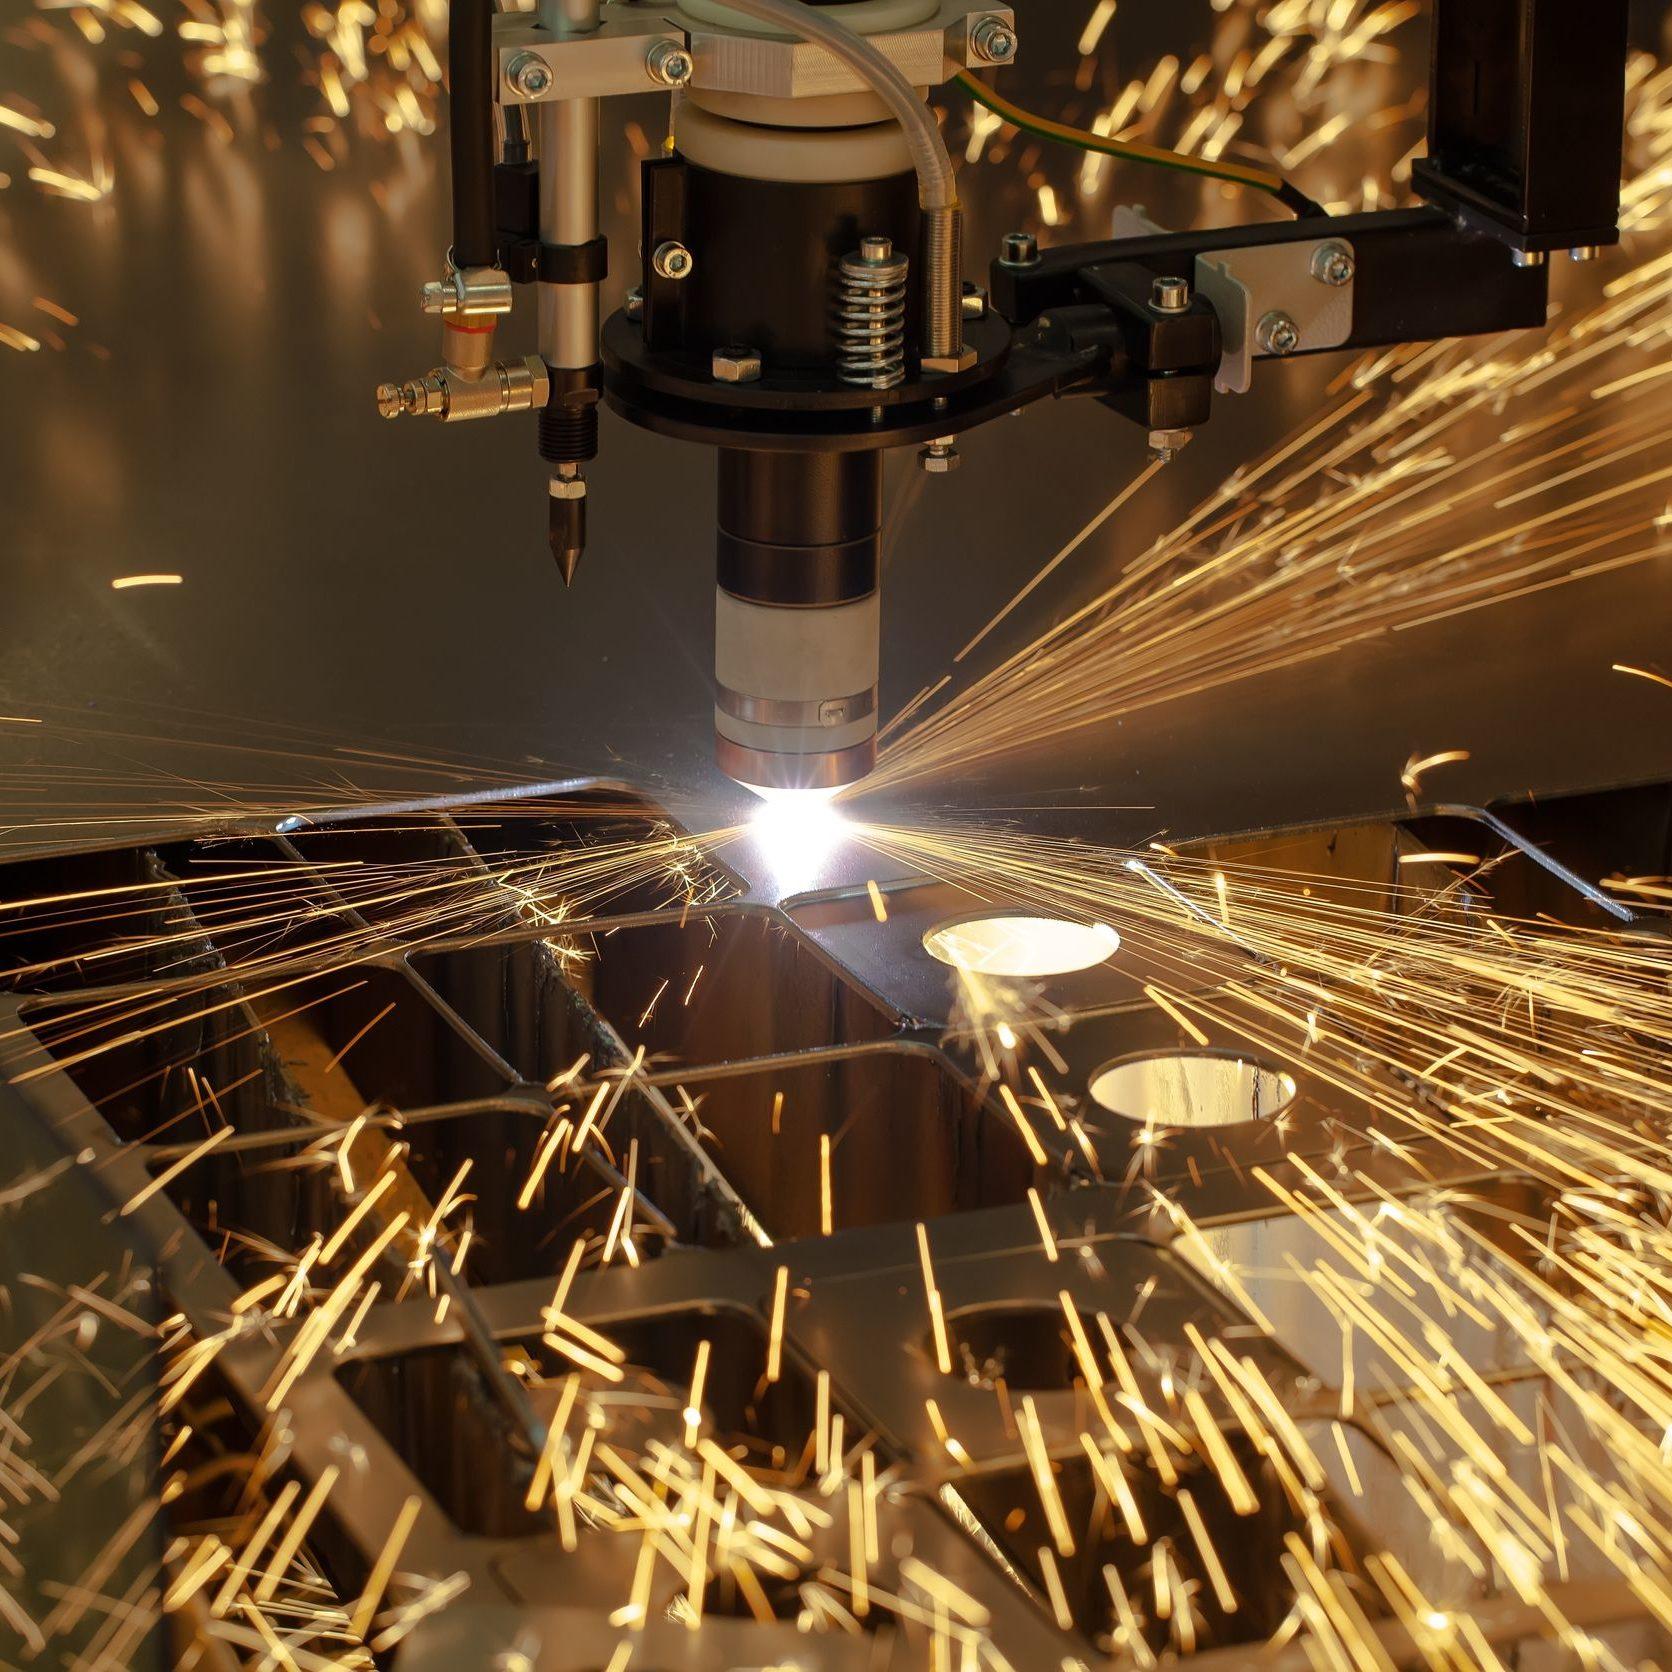 bespoke cooling solution metalwork machine